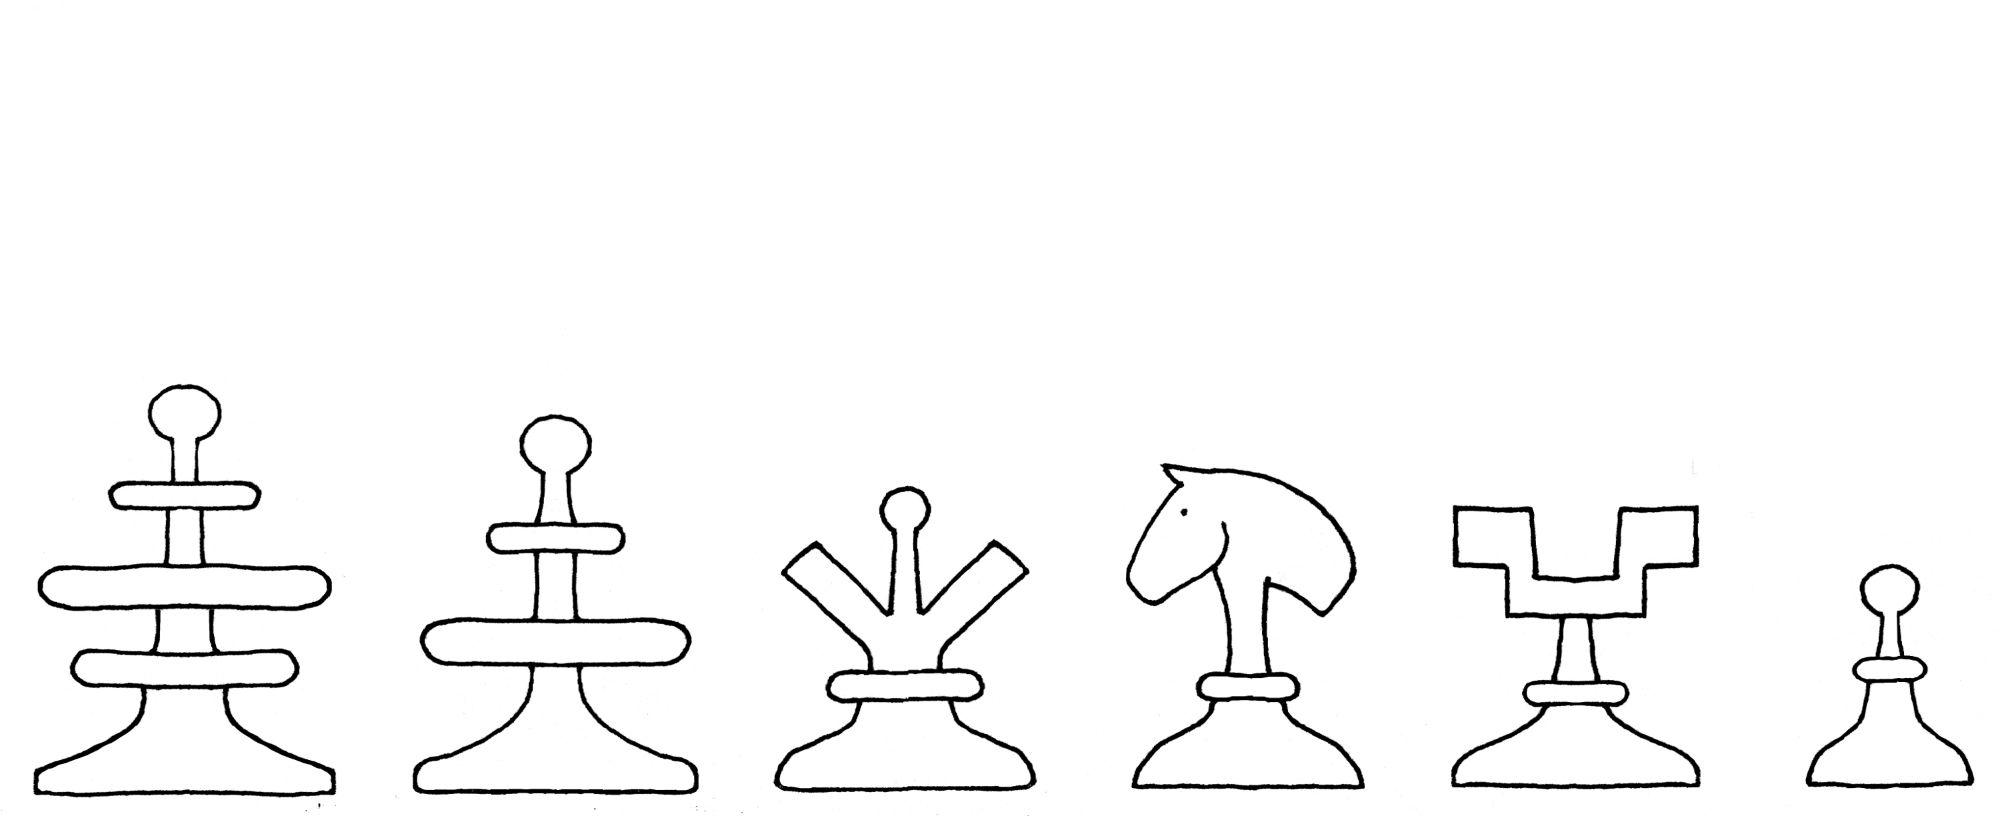 Damiano chess set interpretive diagram